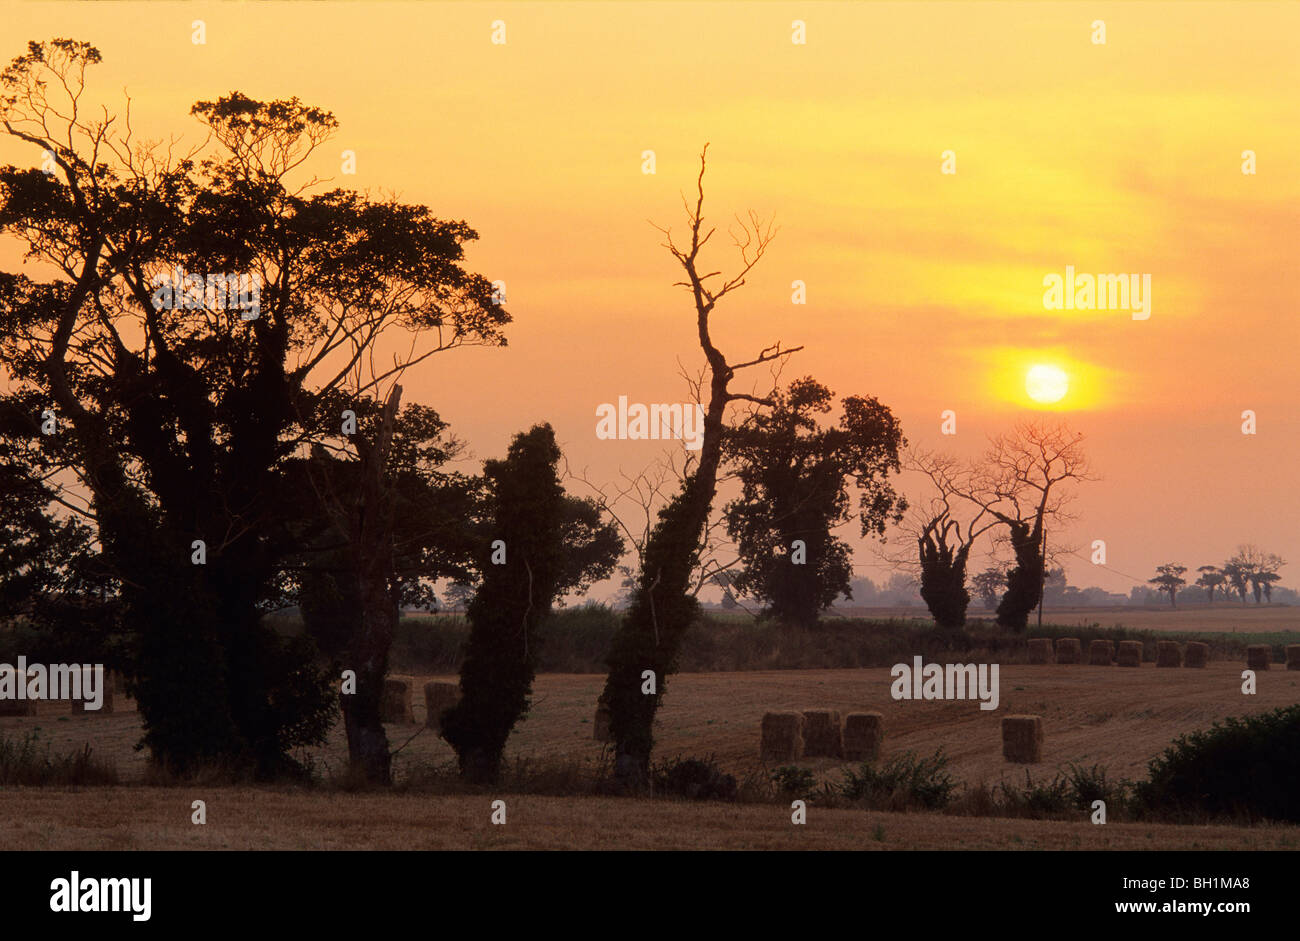 Europe, England, Norfork, sunset near North Lopham - Stock Image